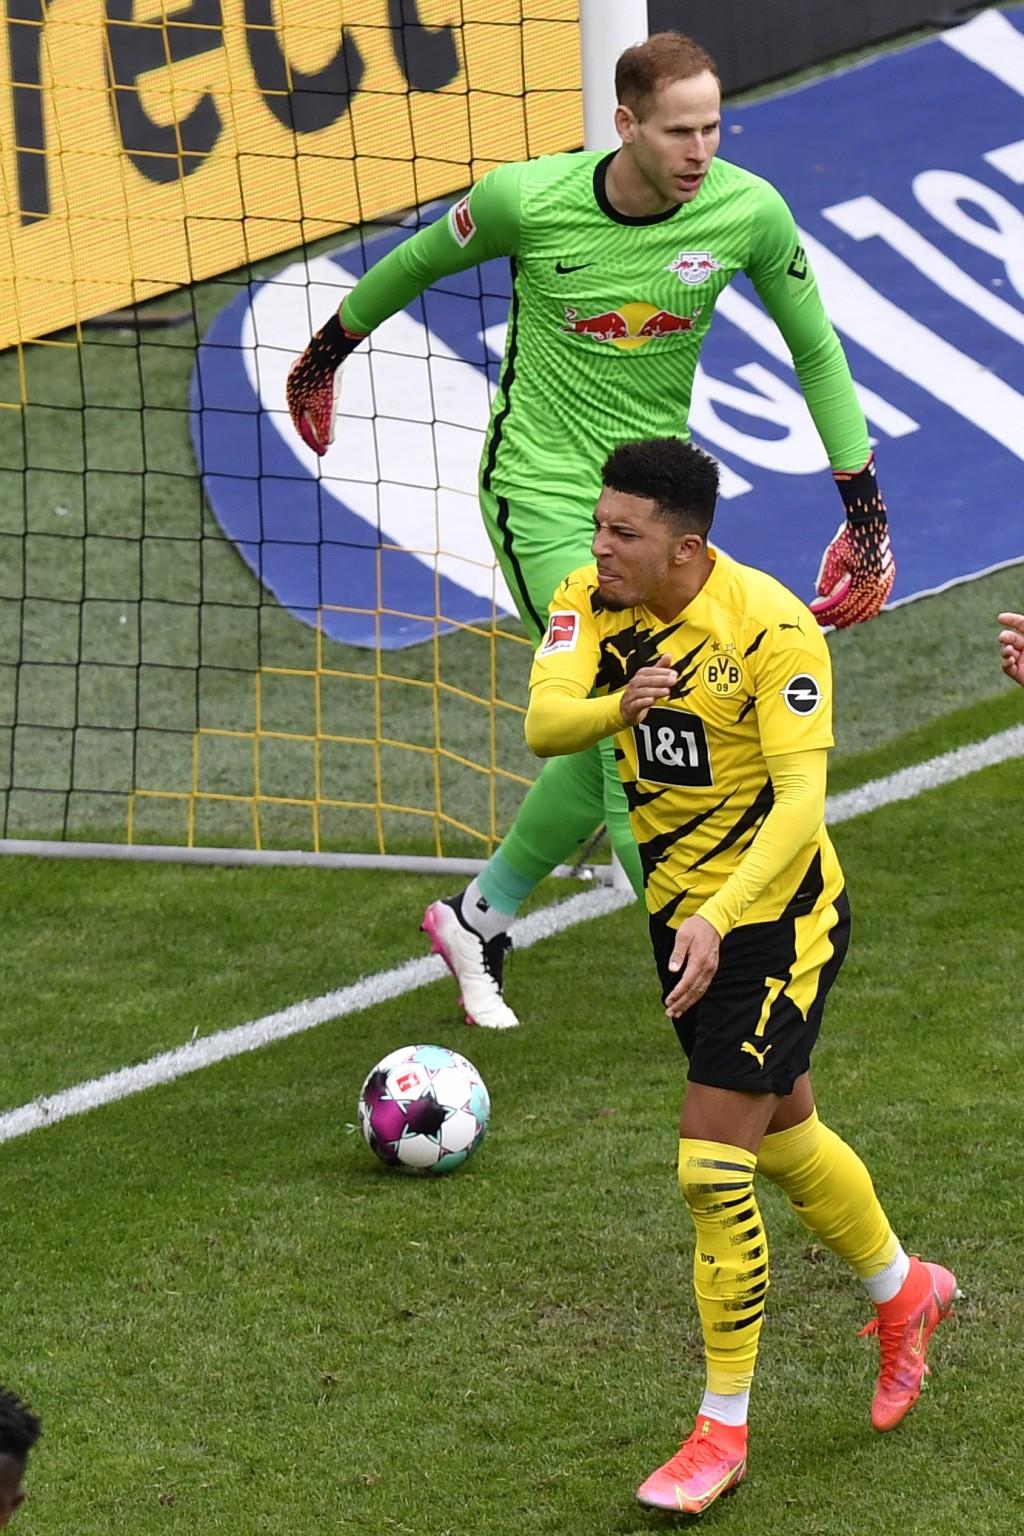 Dortmund's Jadon Sancho celebrates after scoring his side's third goal during the German Bundesliga soccer match between Borussia Dortmund and RB Leip...